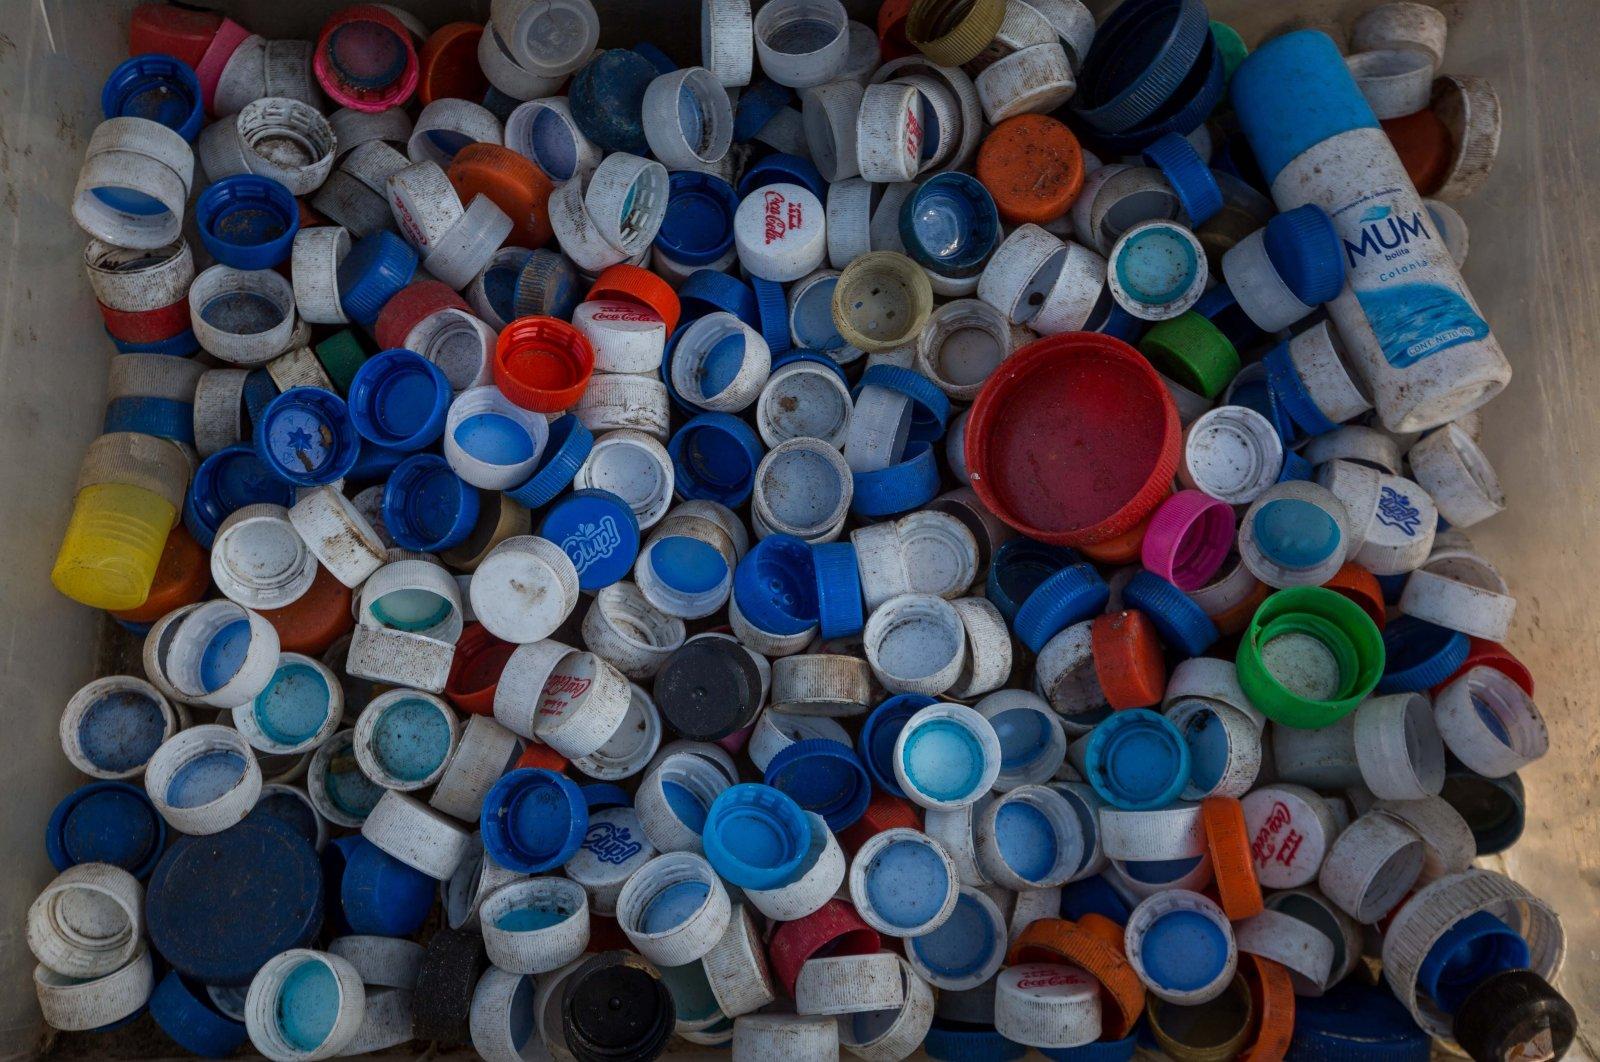 Plastic bottle caps in a box are seen in Caracas, Venezuela, March 04, 2021. (EPA Photo)